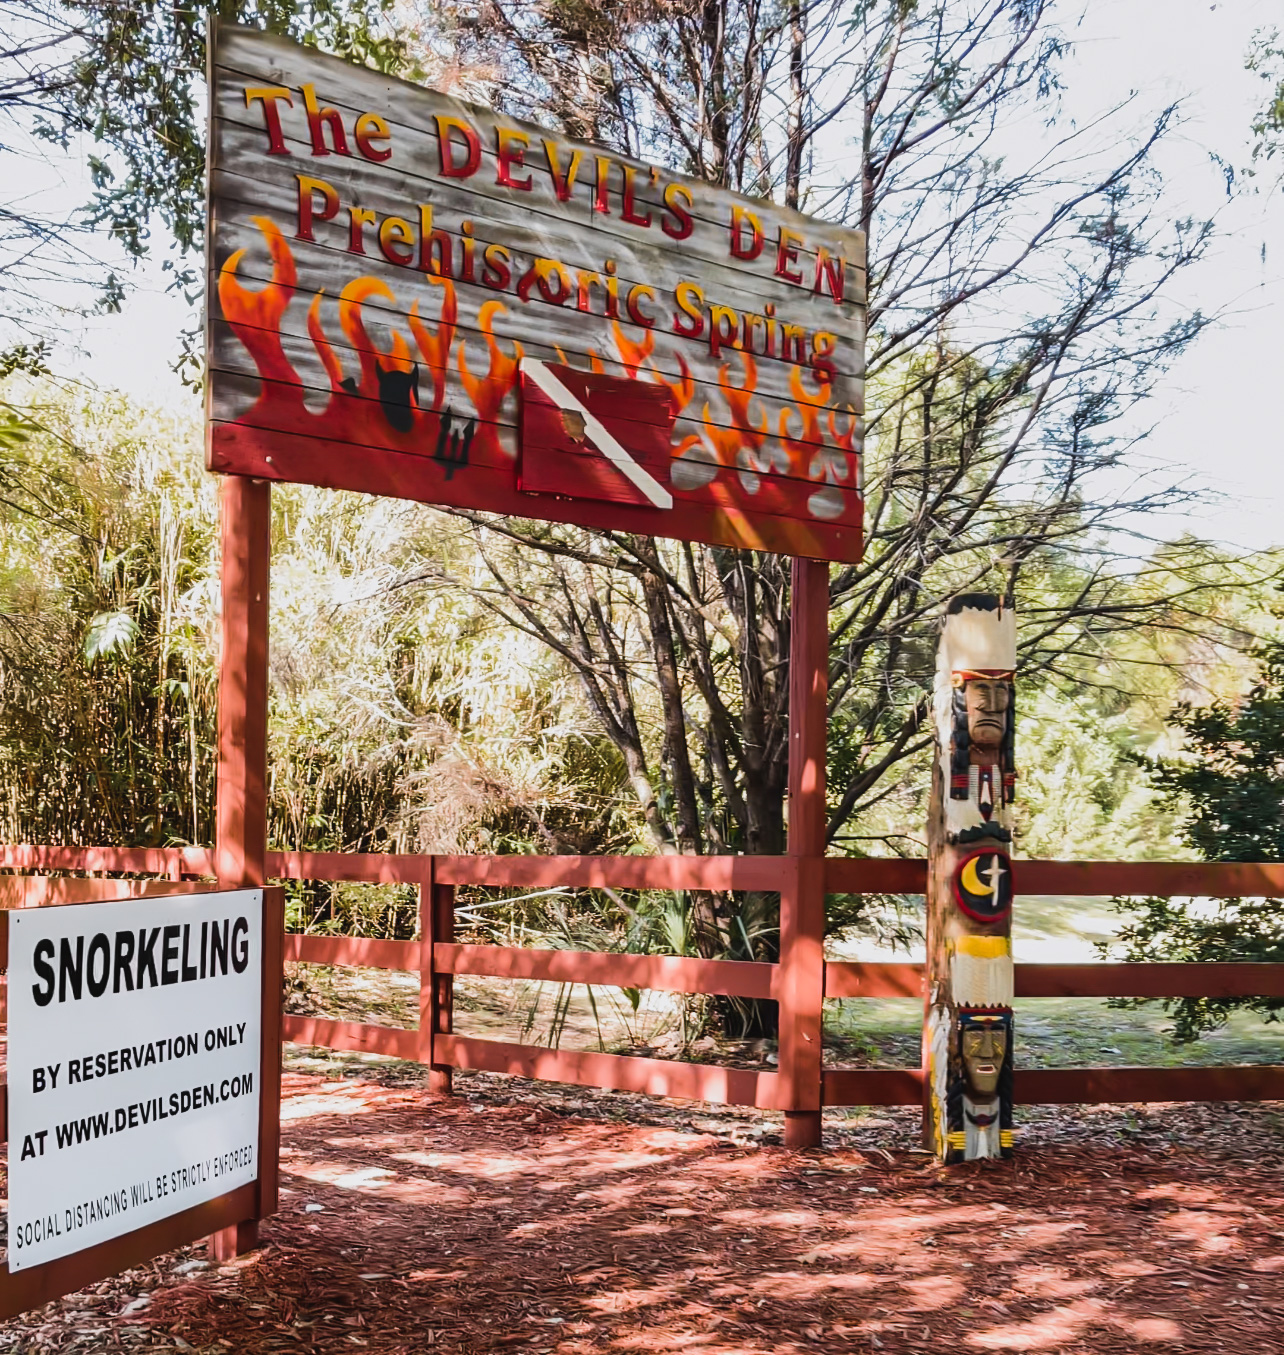 devil's den prehistoric spring entrance sign